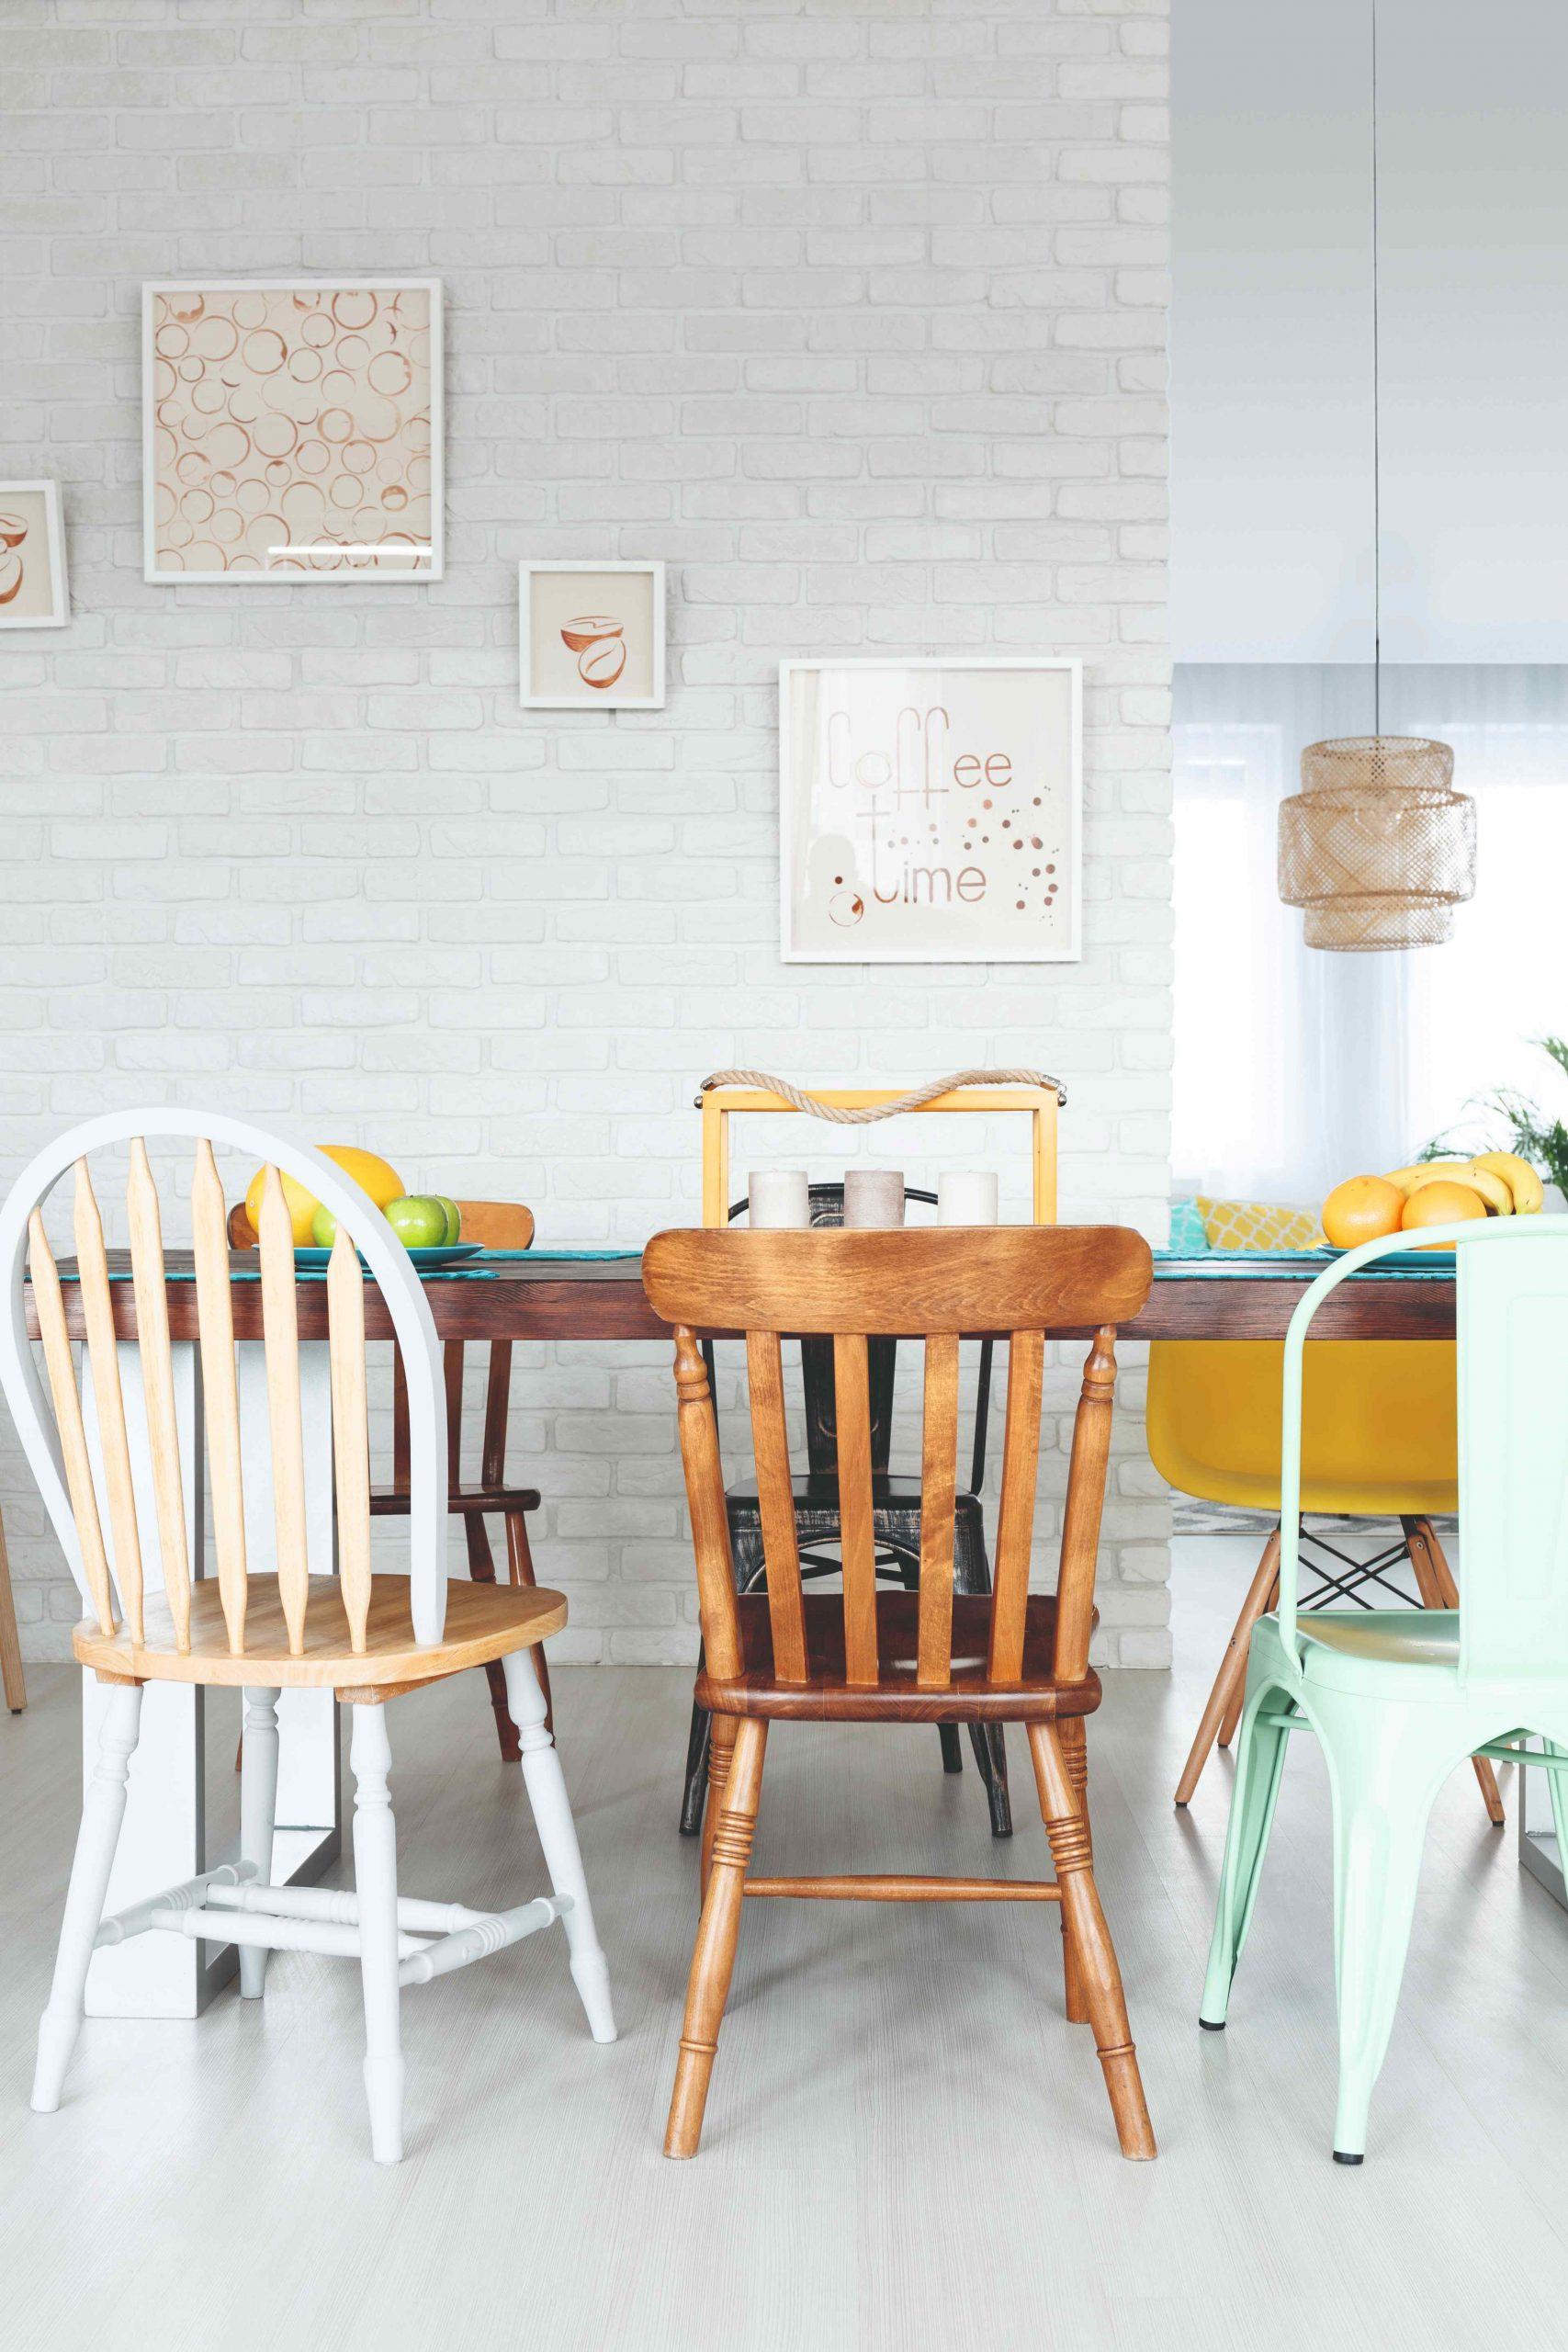 Jedálenský stôl s rôznymi starými stoličkami